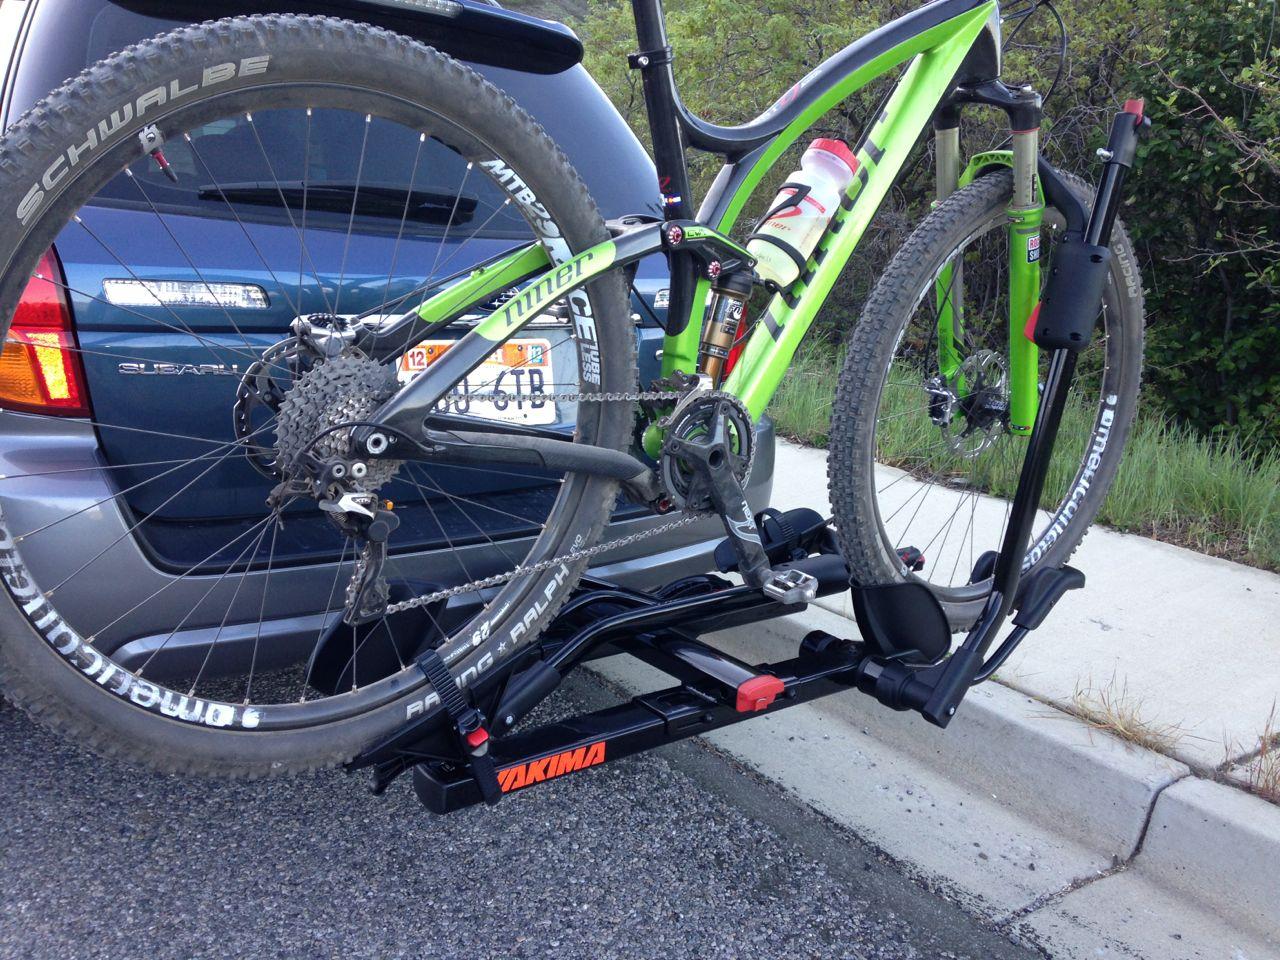 Yakima Holdup 2 Quot Hitch Bike Rack Review Feedthehabit Com